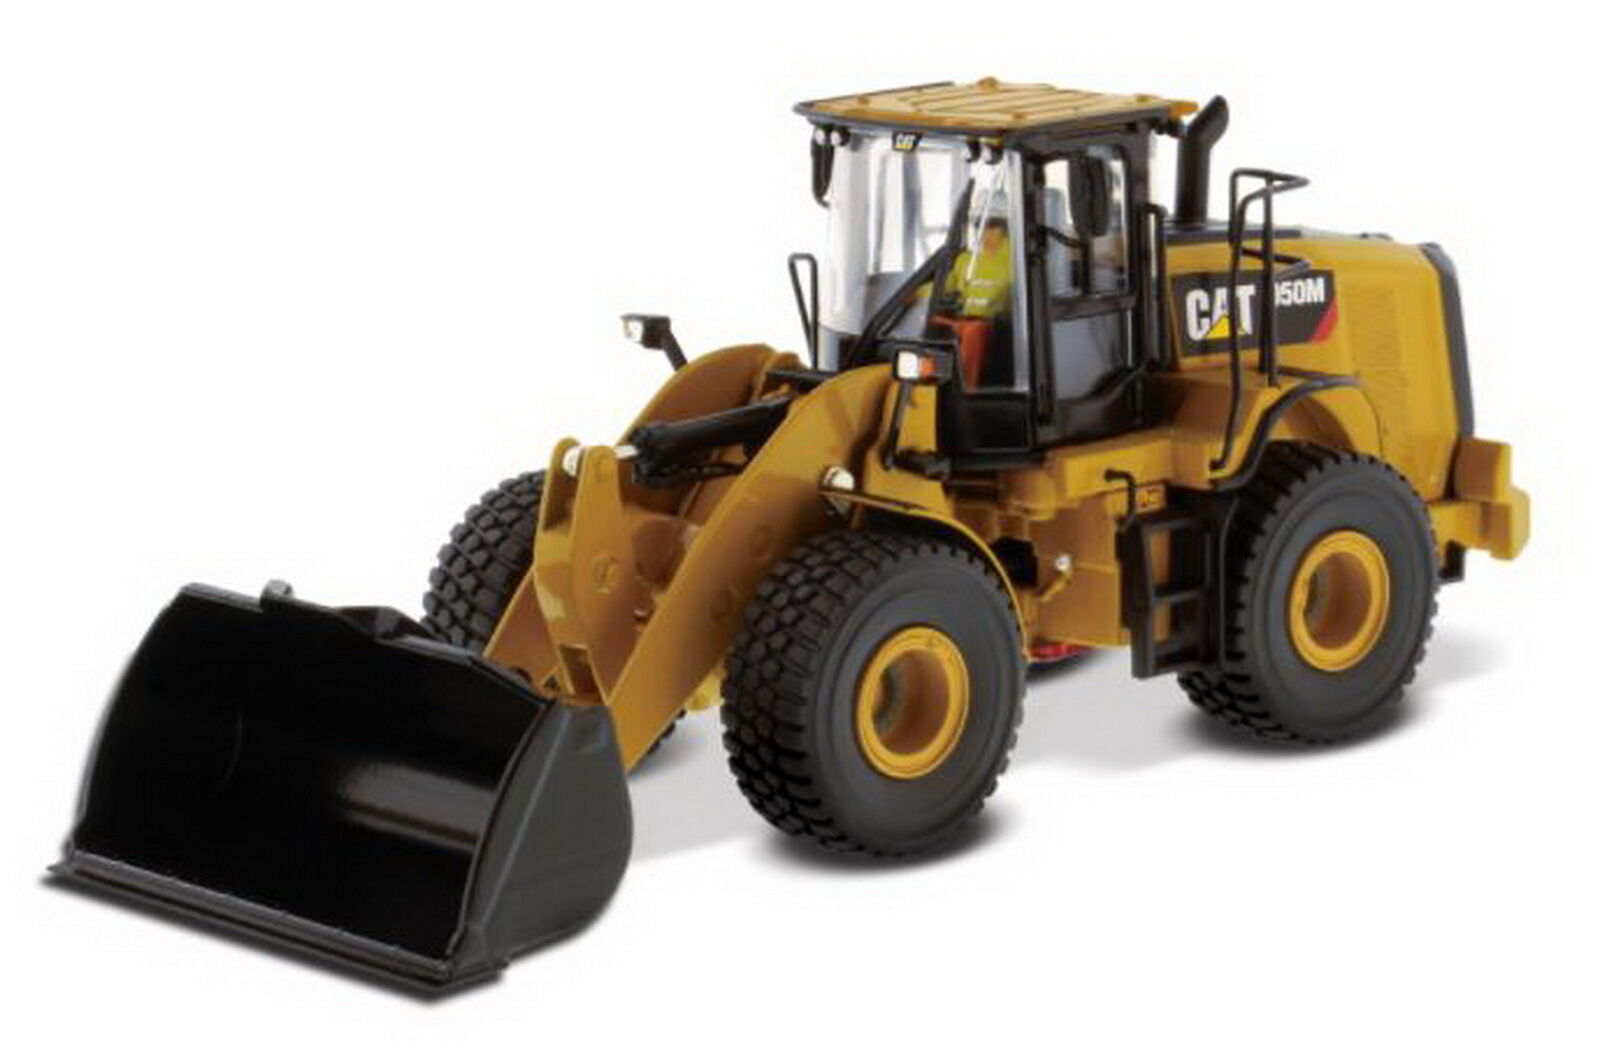 1 50 dm Caterpillar Cat 950M Rueda Cargador Diecast Modelo